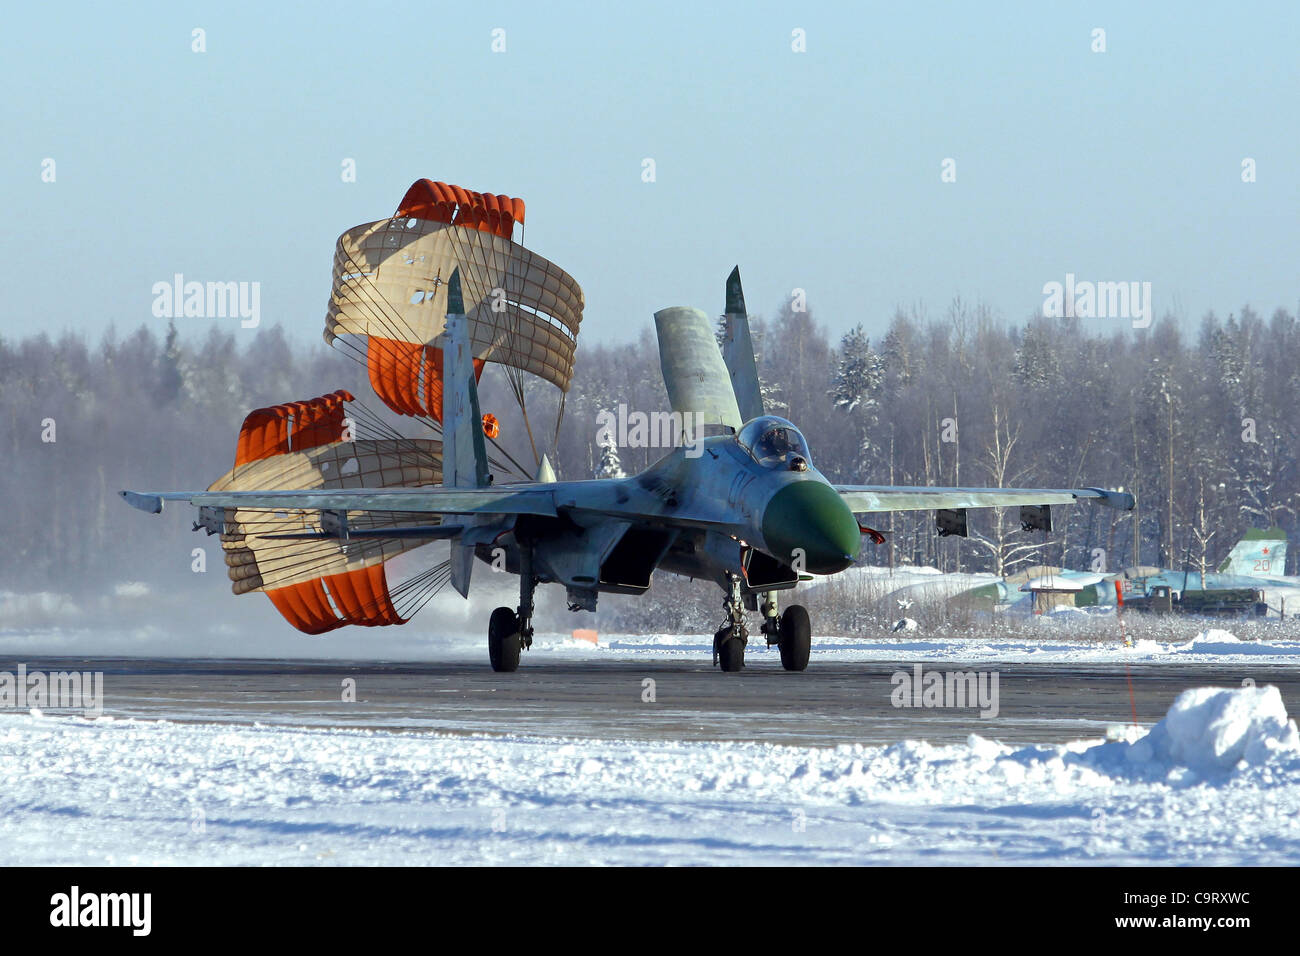 Petrozavodsk Airport (Besovets): history, description, schedule 38